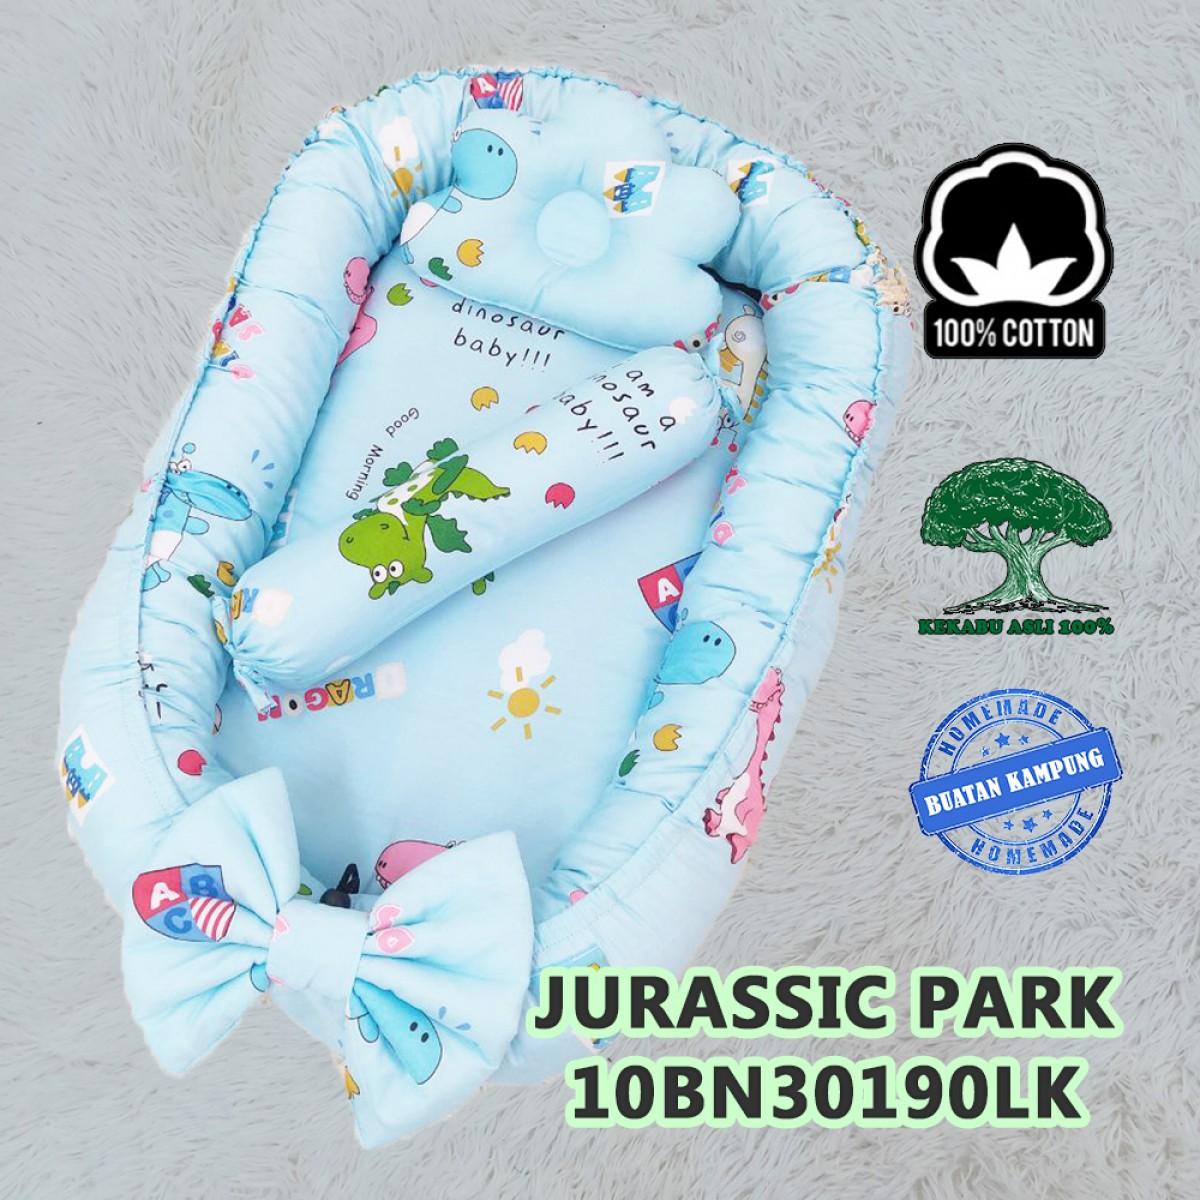 Jurassic Park - Kico Baby Center